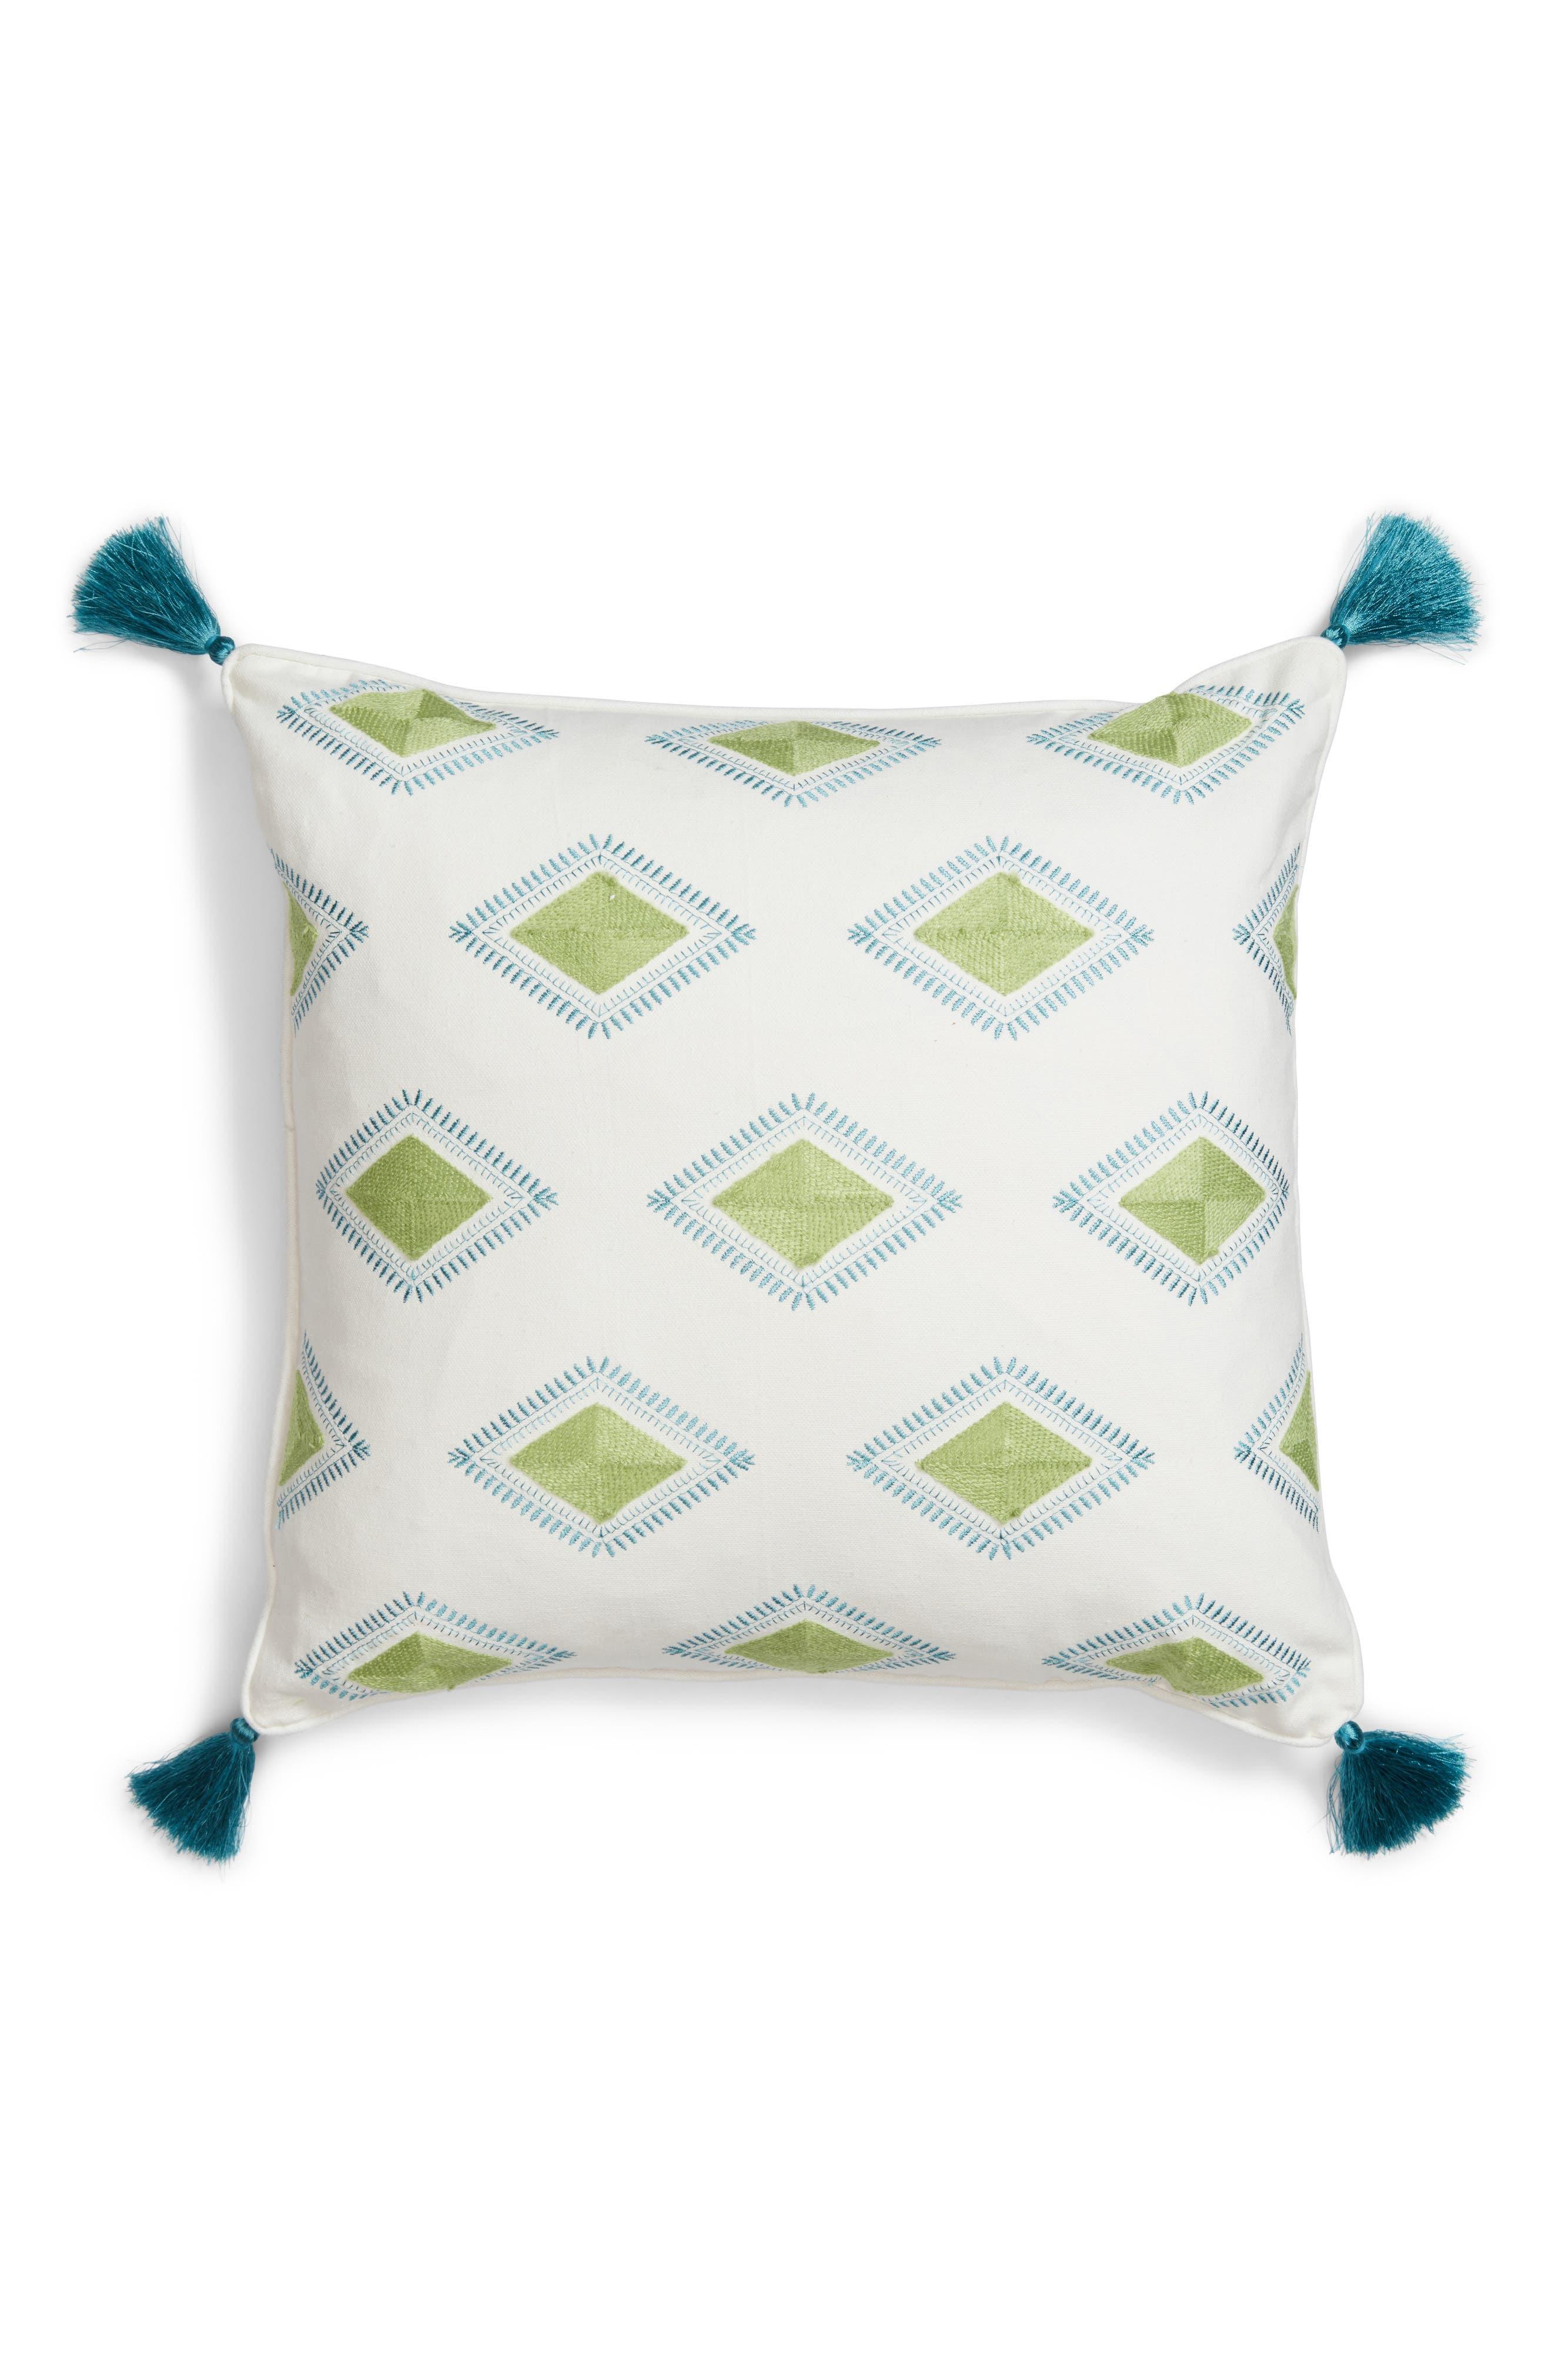 Luca Accent Pillow,                             Main thumbnail 1, color,                             Green